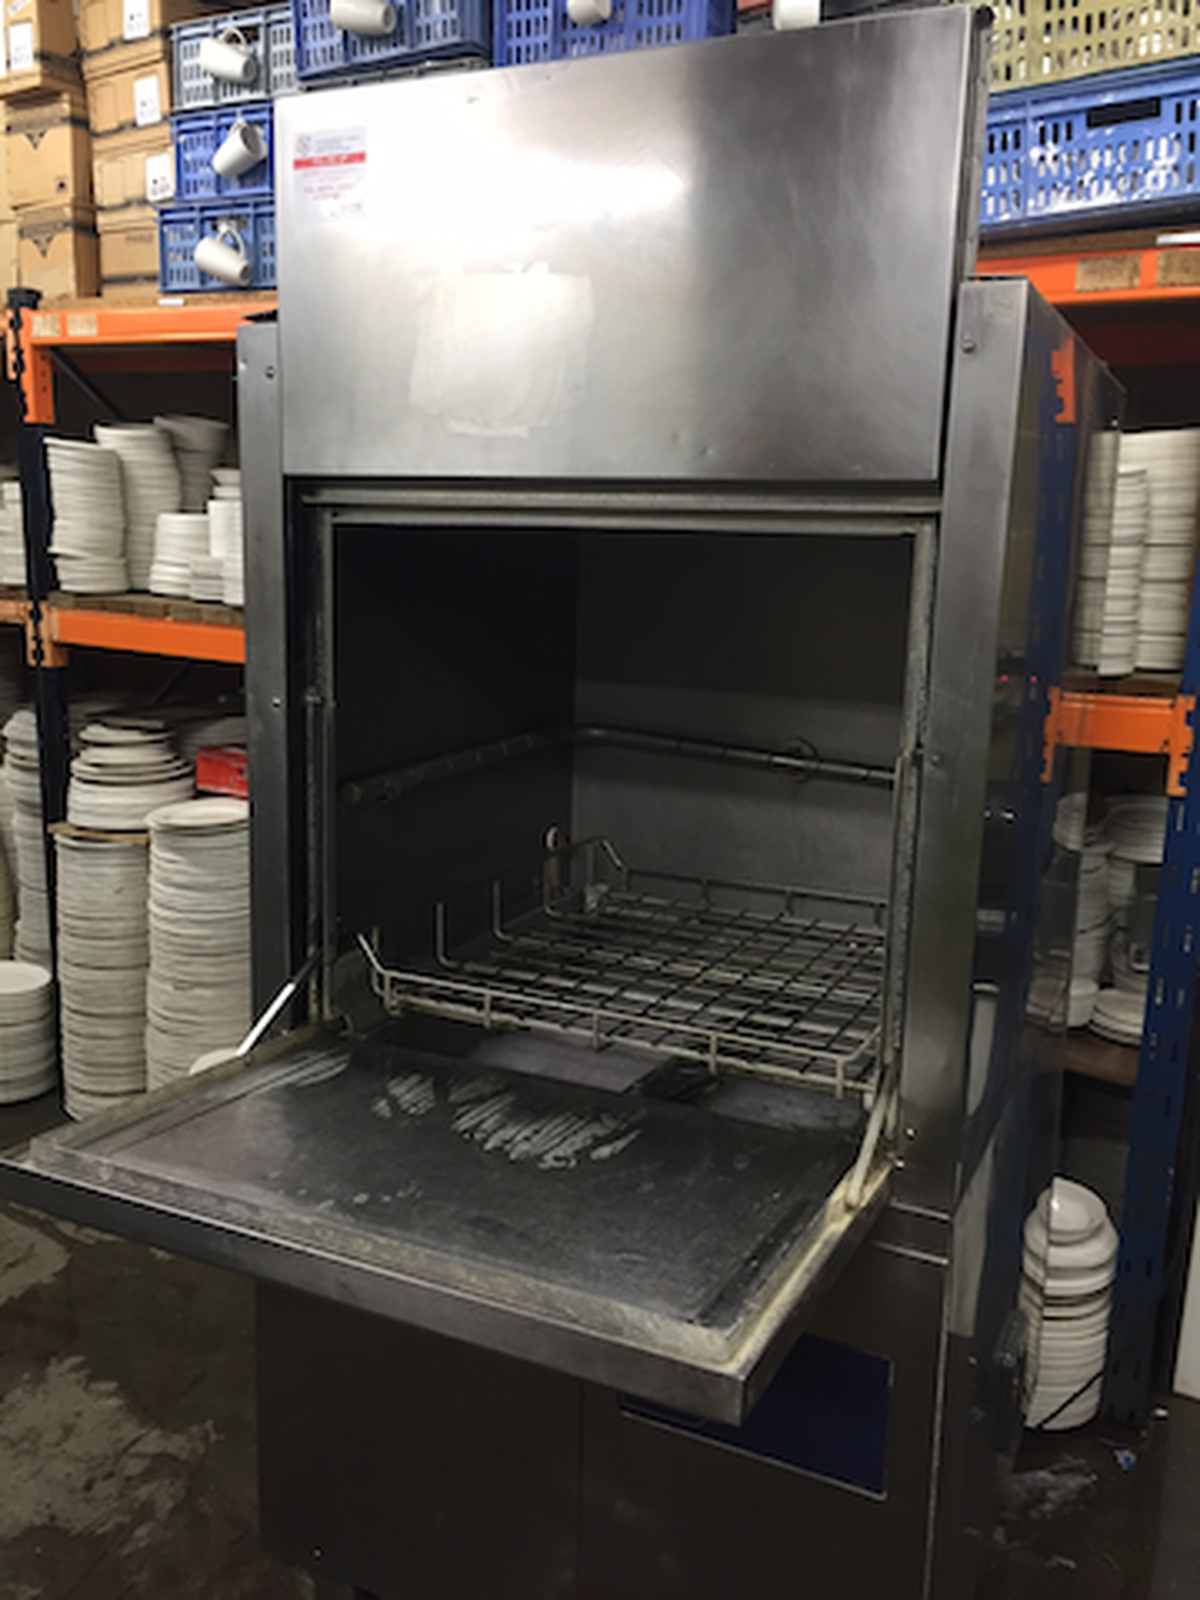 Table Top Dishwasher London : ... Catering - London Electrolux WT830MUK Pot Wash / Dishwasher - London